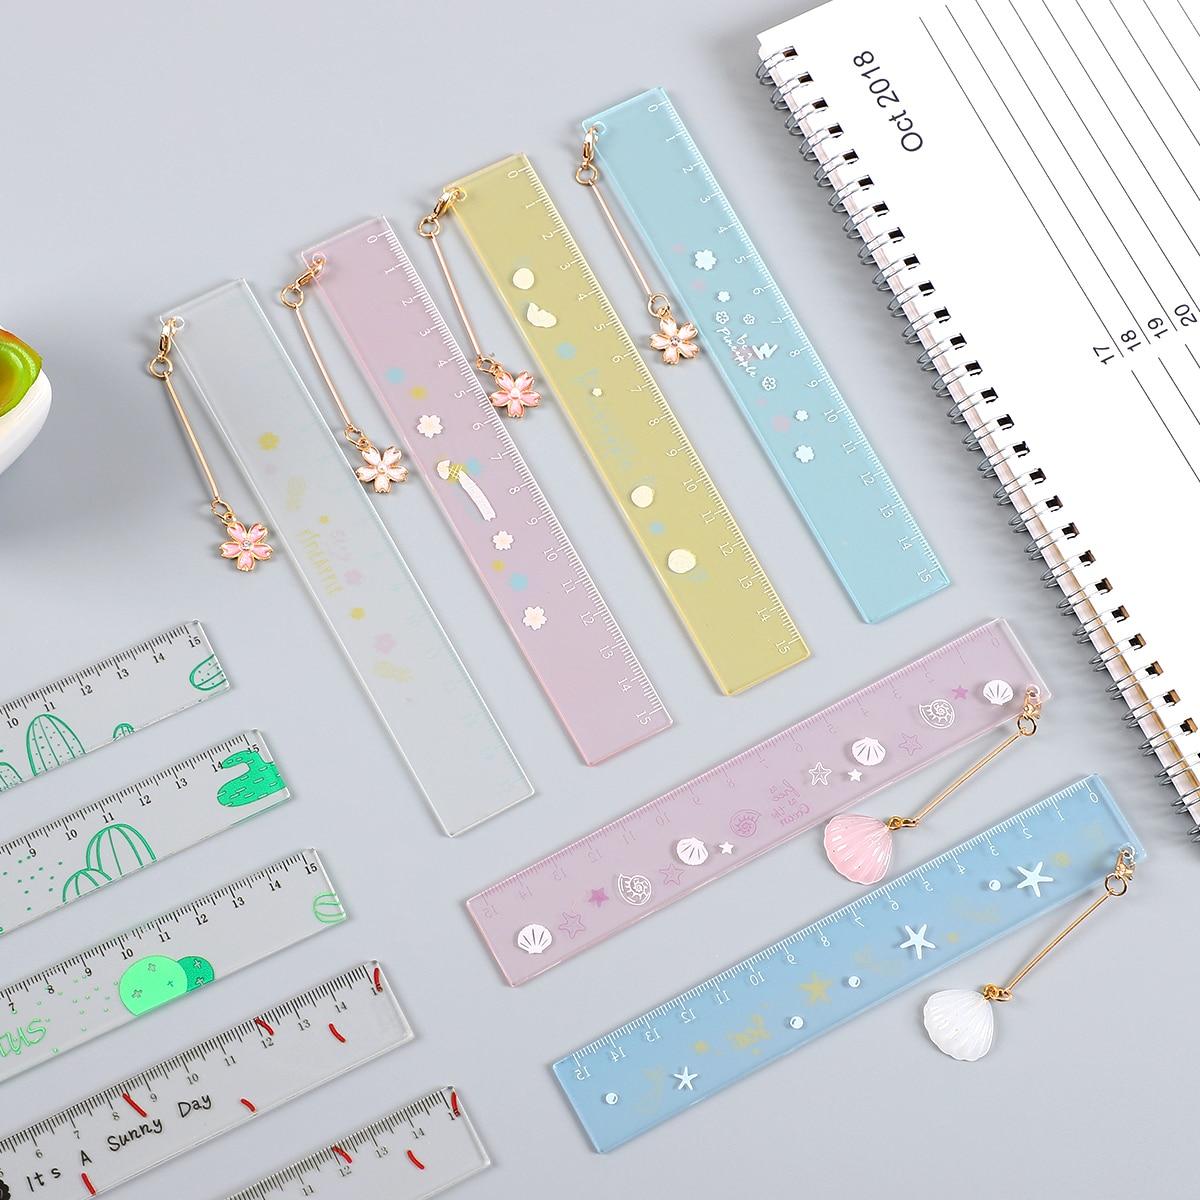 JIANWU 1pcs Simple Cute Style 15cm Transparent Acrylic Hanging Ruler Simple Ruler Square Ruler Kawaii Bookmark Ruler